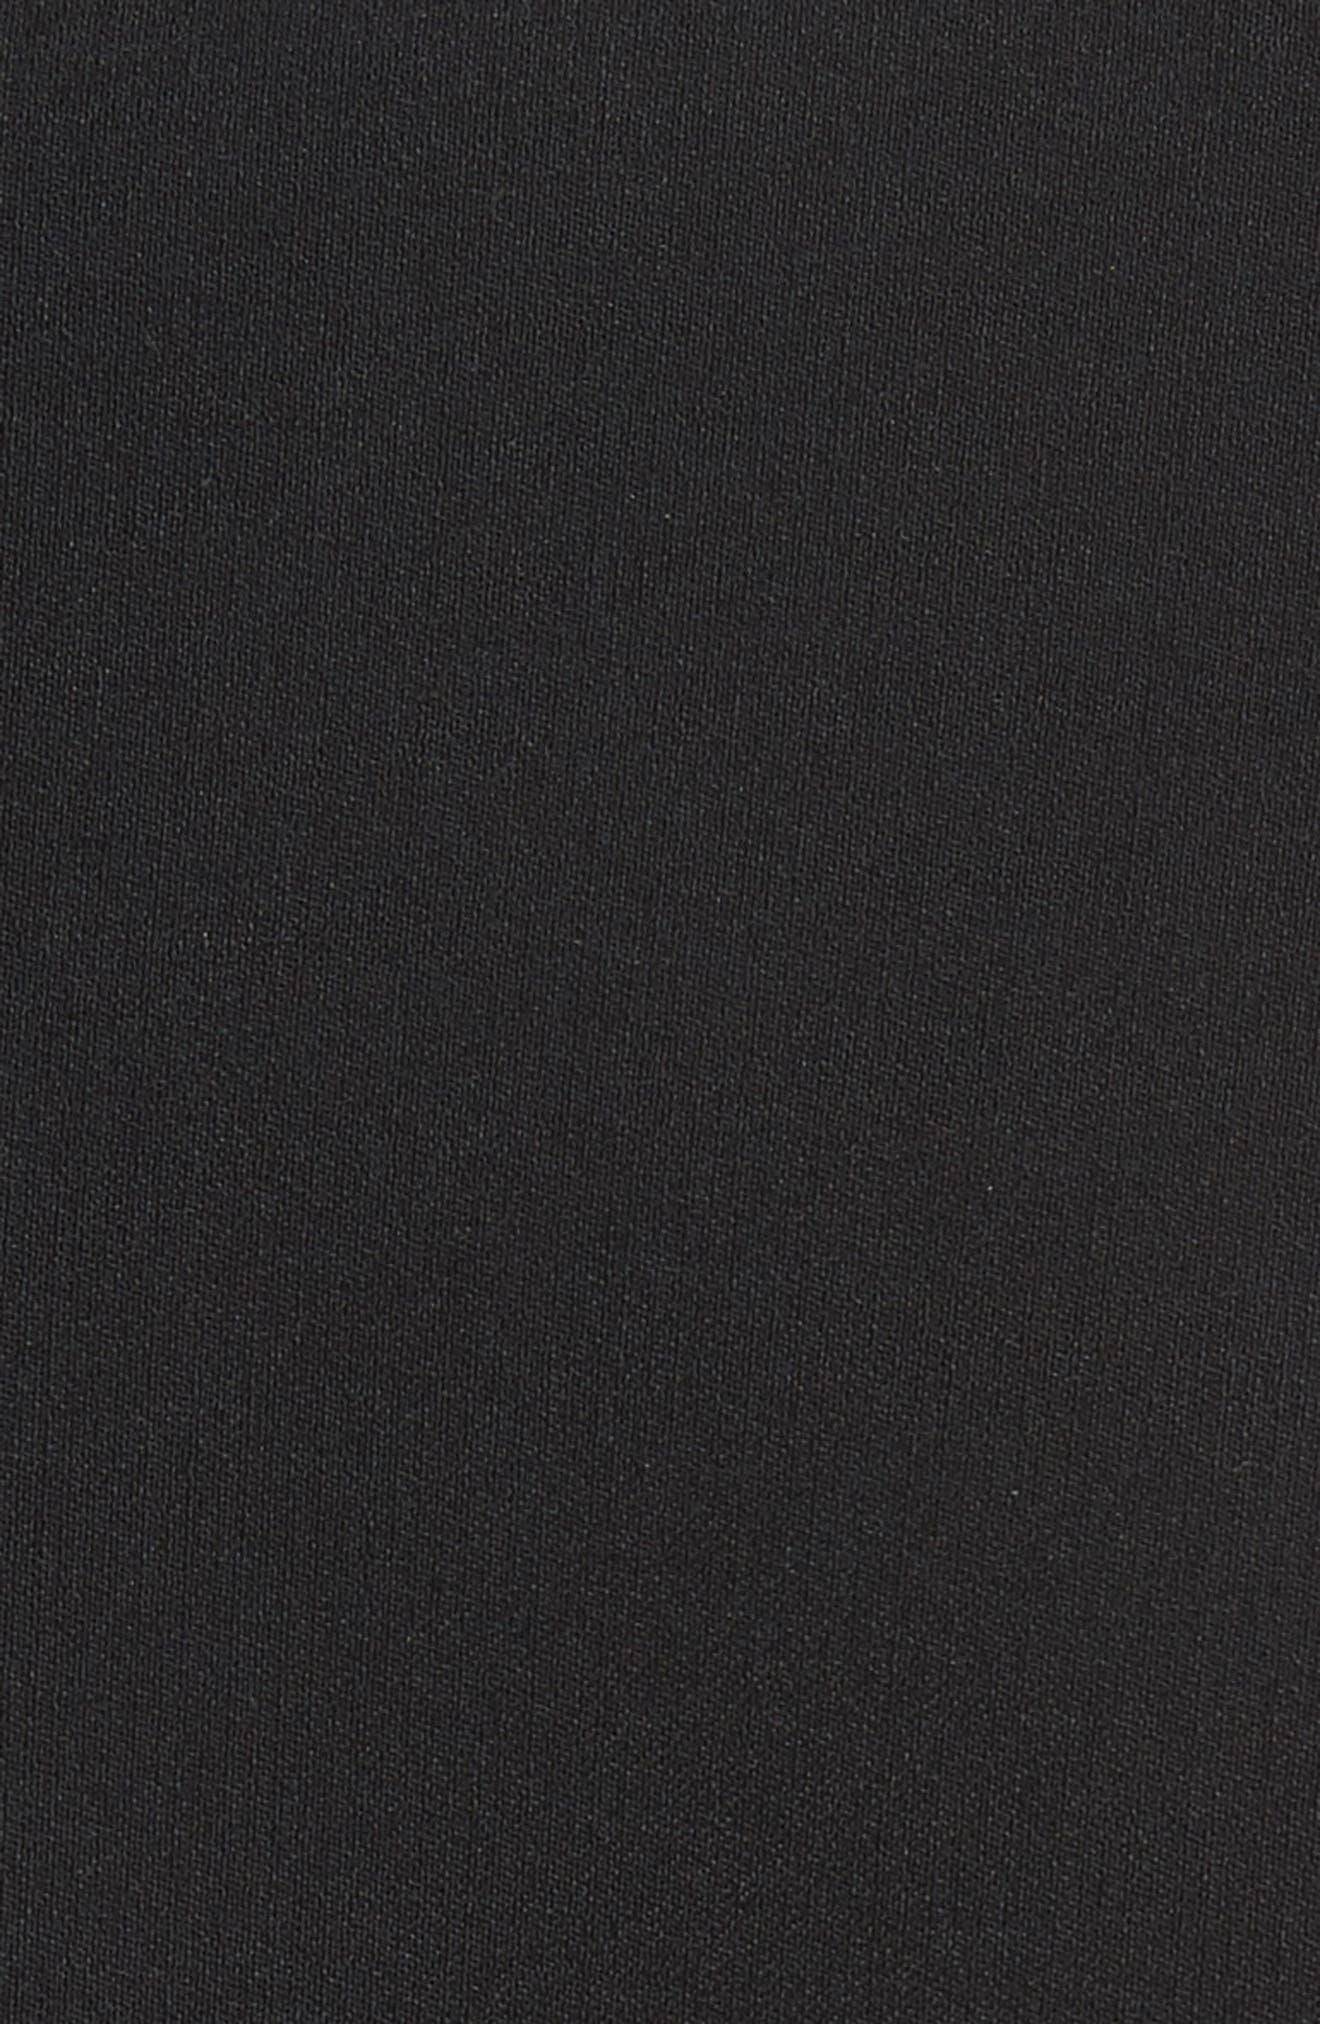 Belted Wool Blend Pebble Crepe Blazer,                             Alternate thumbnail 7, color,                             BLACK